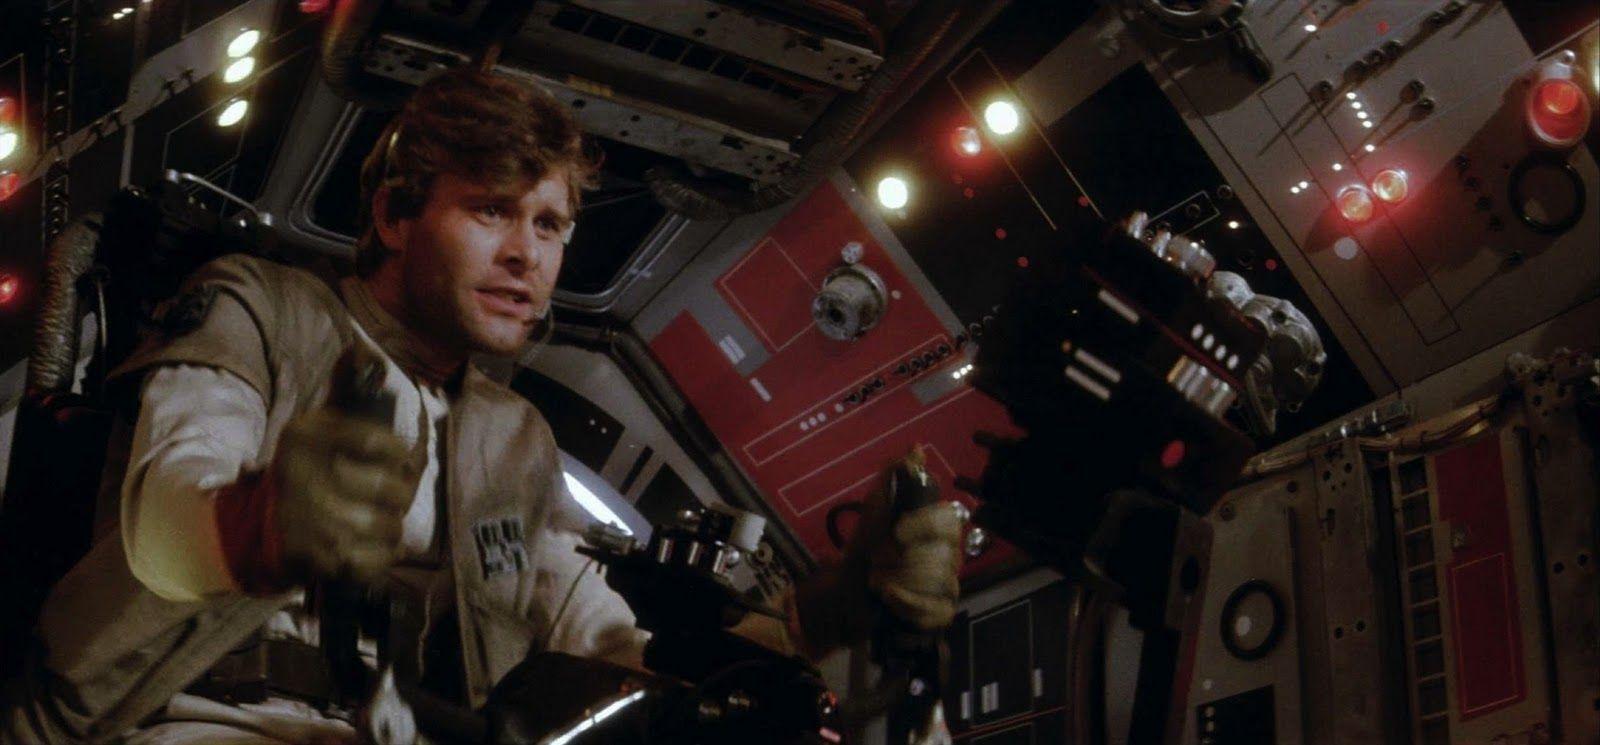 Rebel Soldier aboard the Millennium Falcon